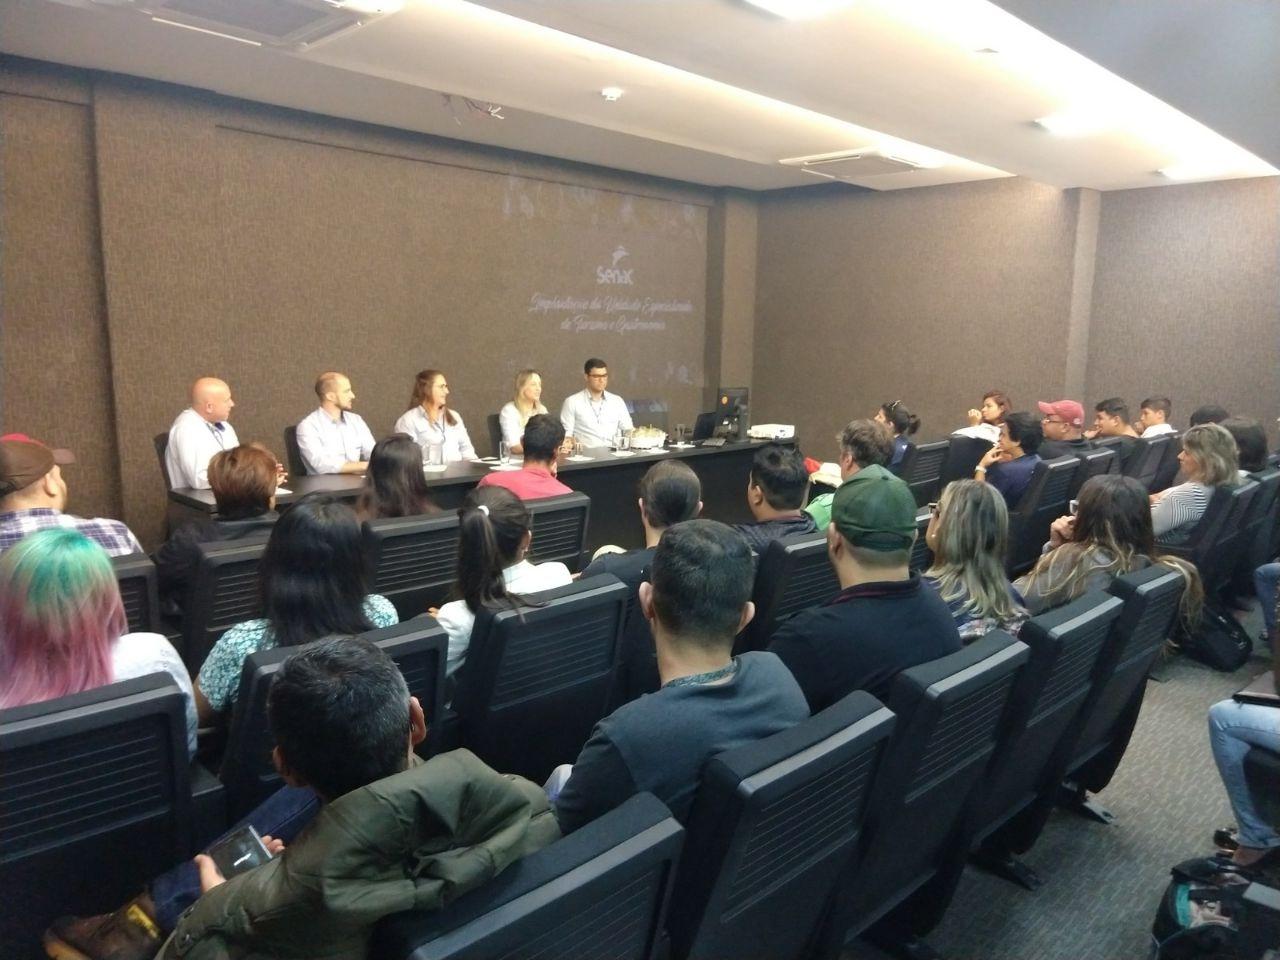 Senac Turismo e Gastronomia sedia palestra sobre a economia no século XXI